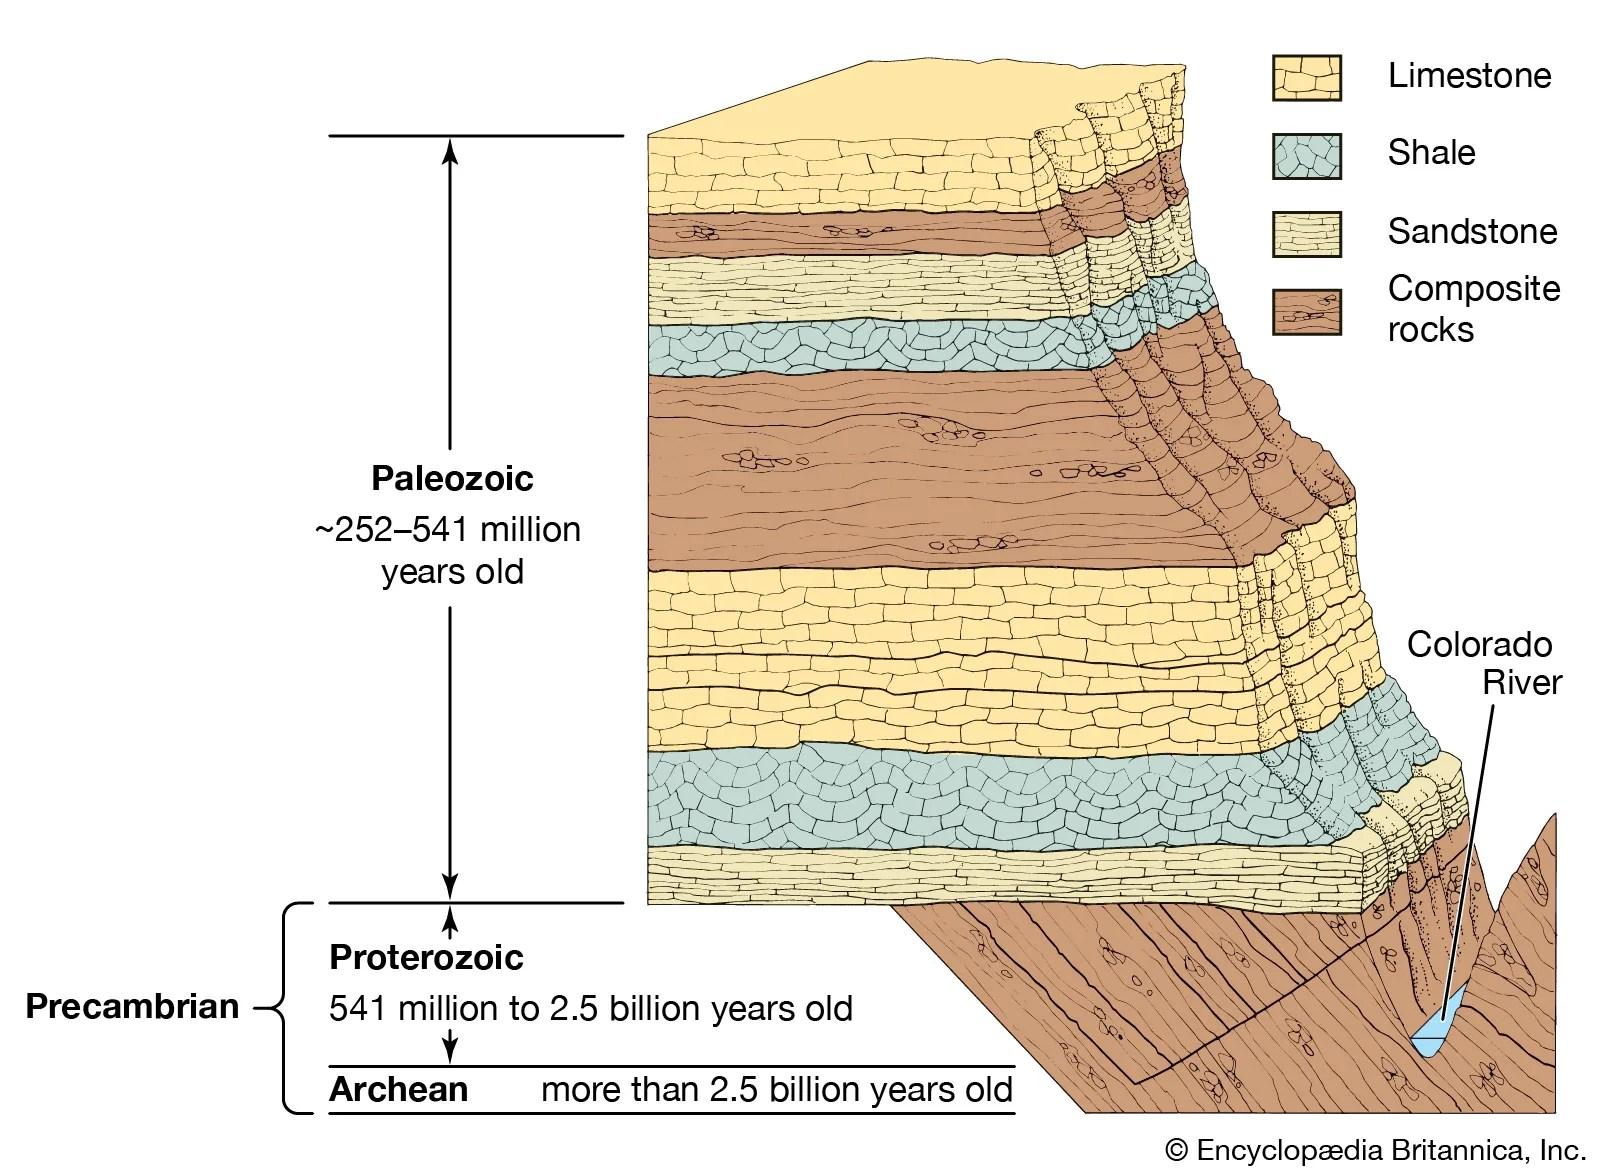 Geochronology